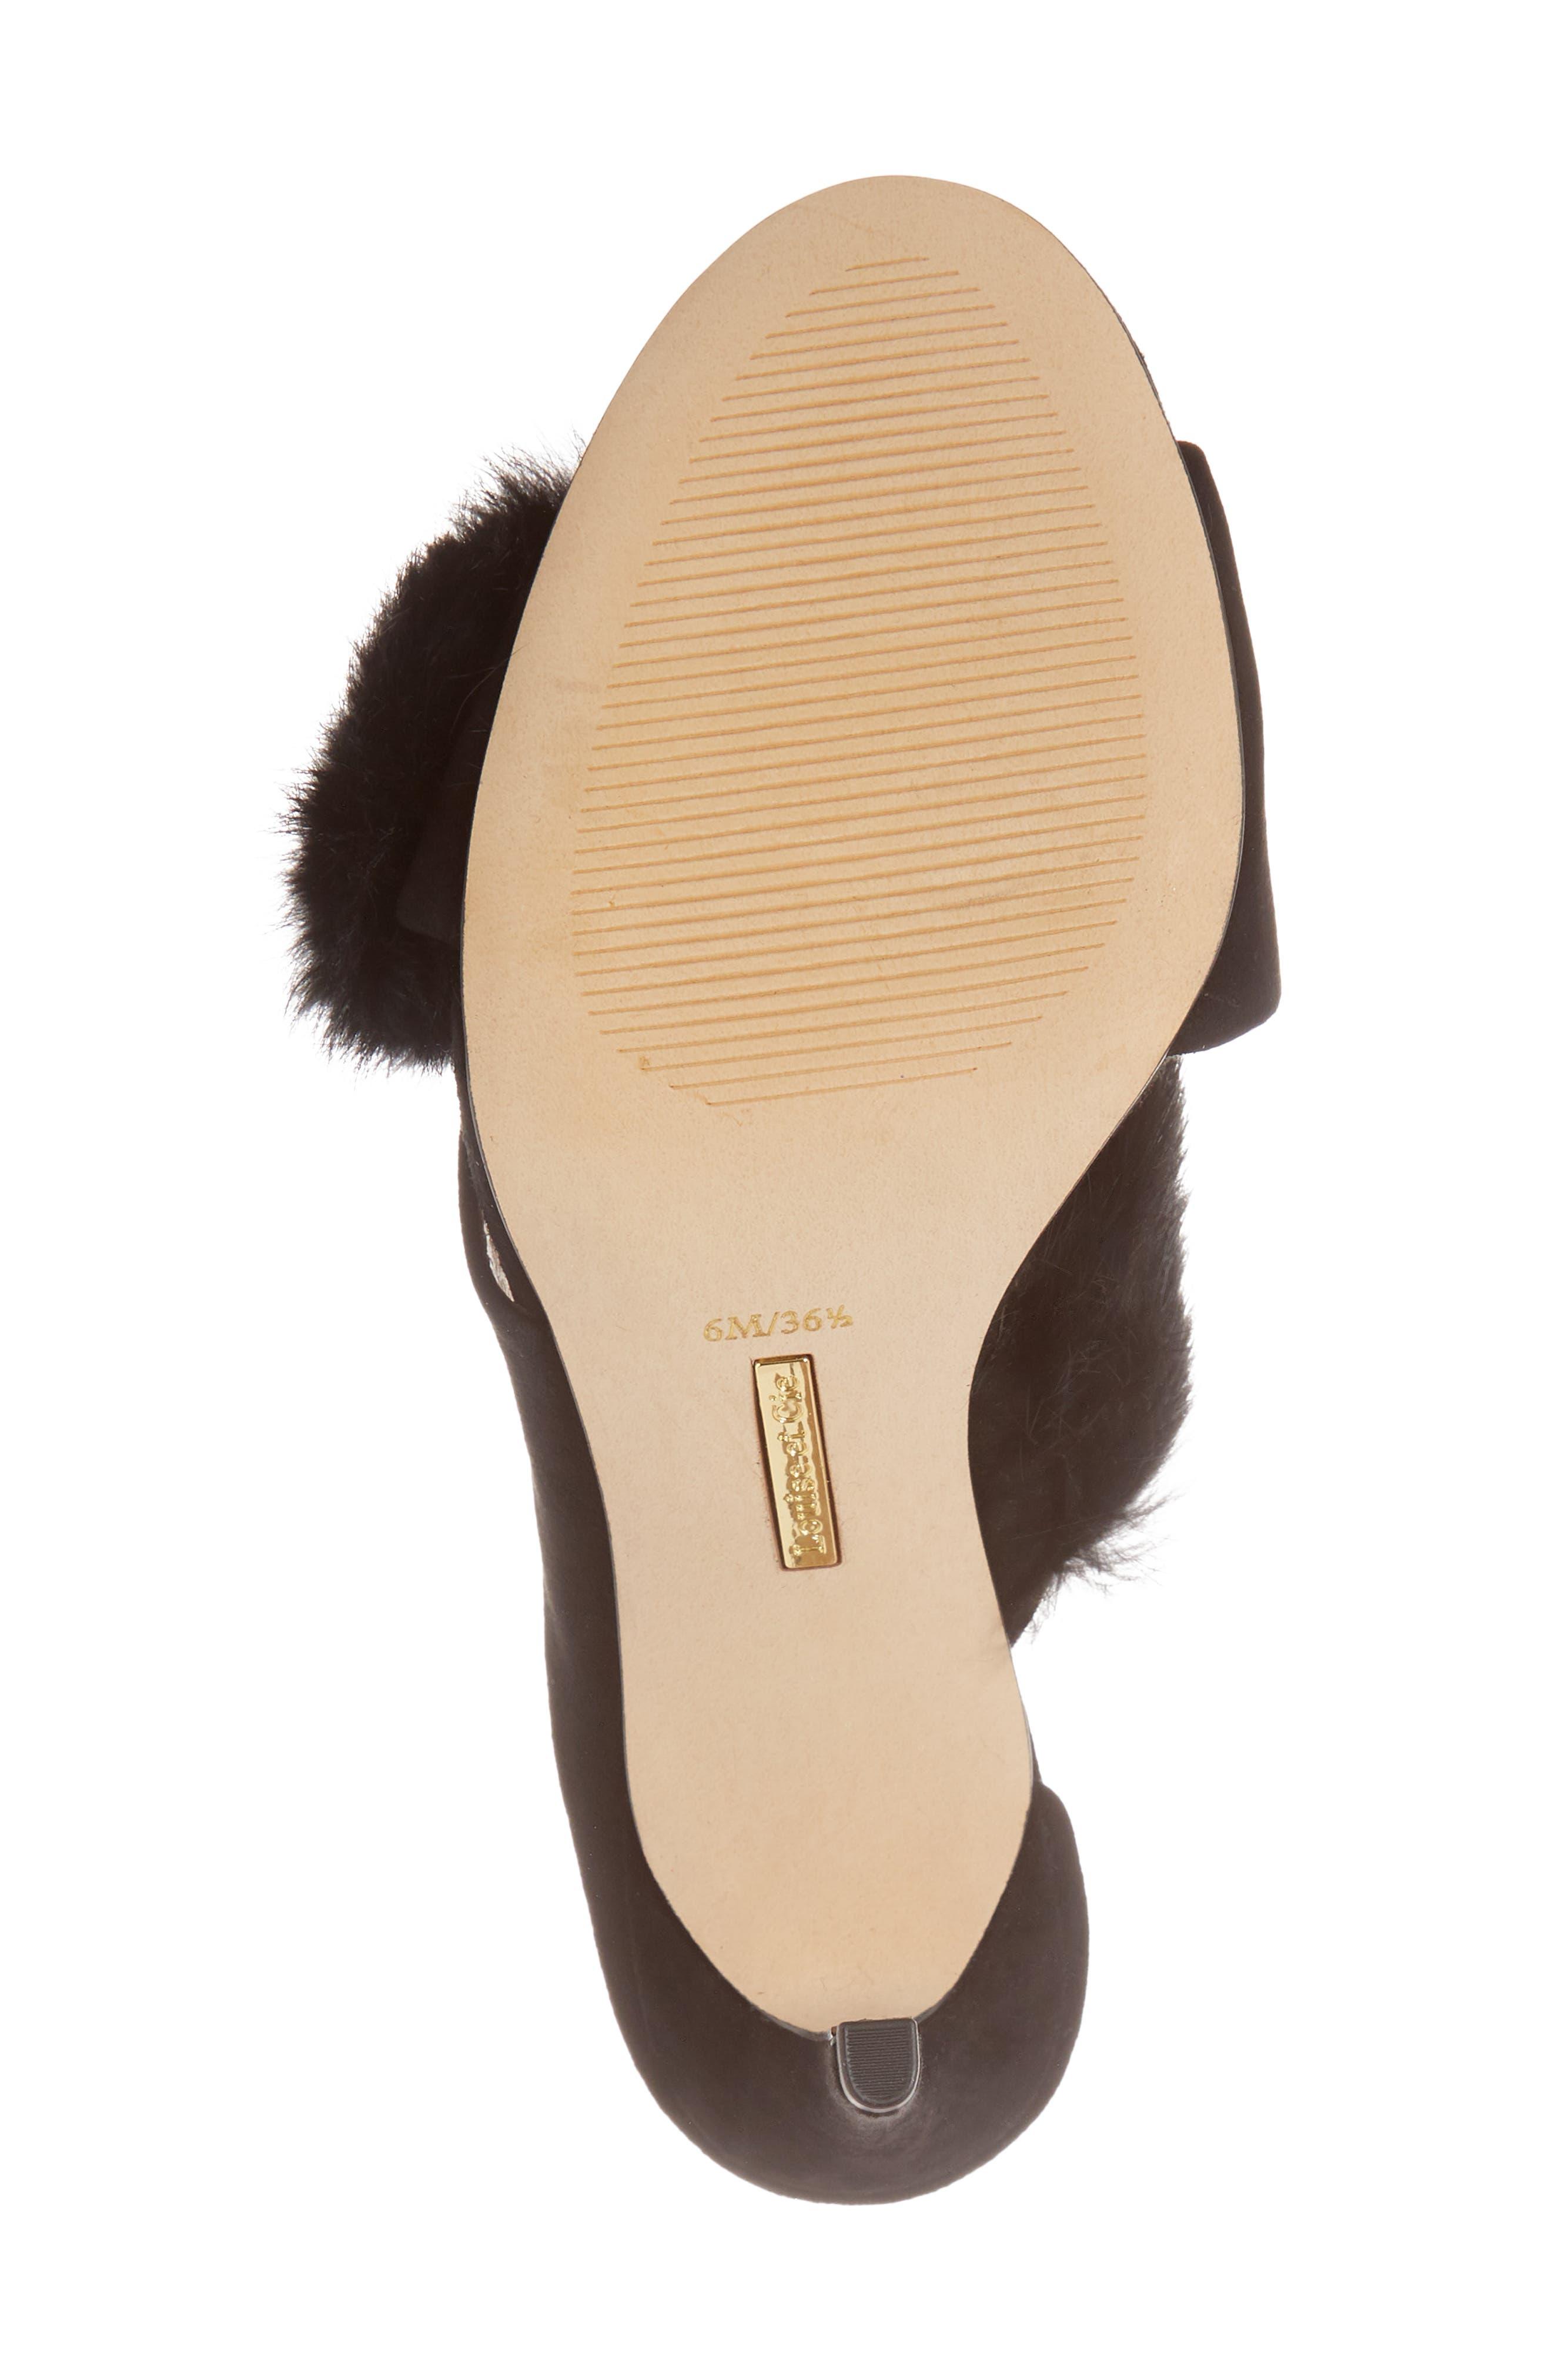 Halloway Genuine Rabbit Fur Sandal,                             Alternate thumbnail 6, color,                             BLACK RABBIT FUR